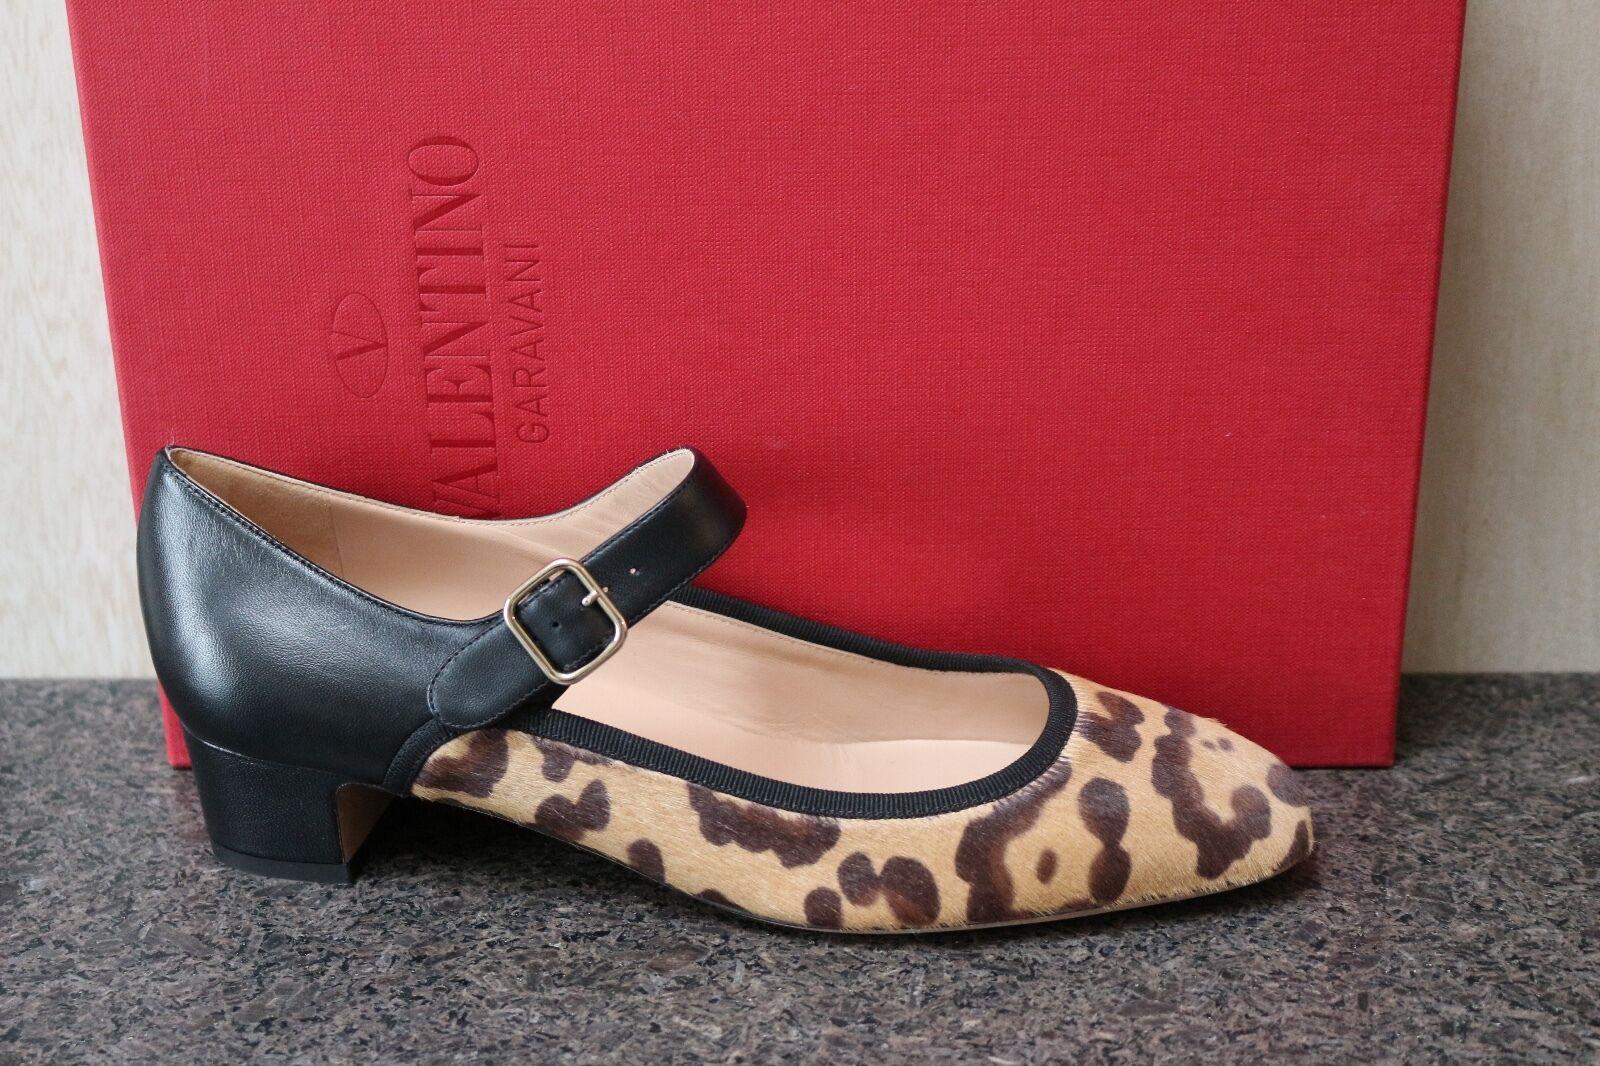 NIB VALENTINO GARAVANI LEOPARD PRINT PONY HAIR LEATHER MARY JANE PUMP chaussures 37.5